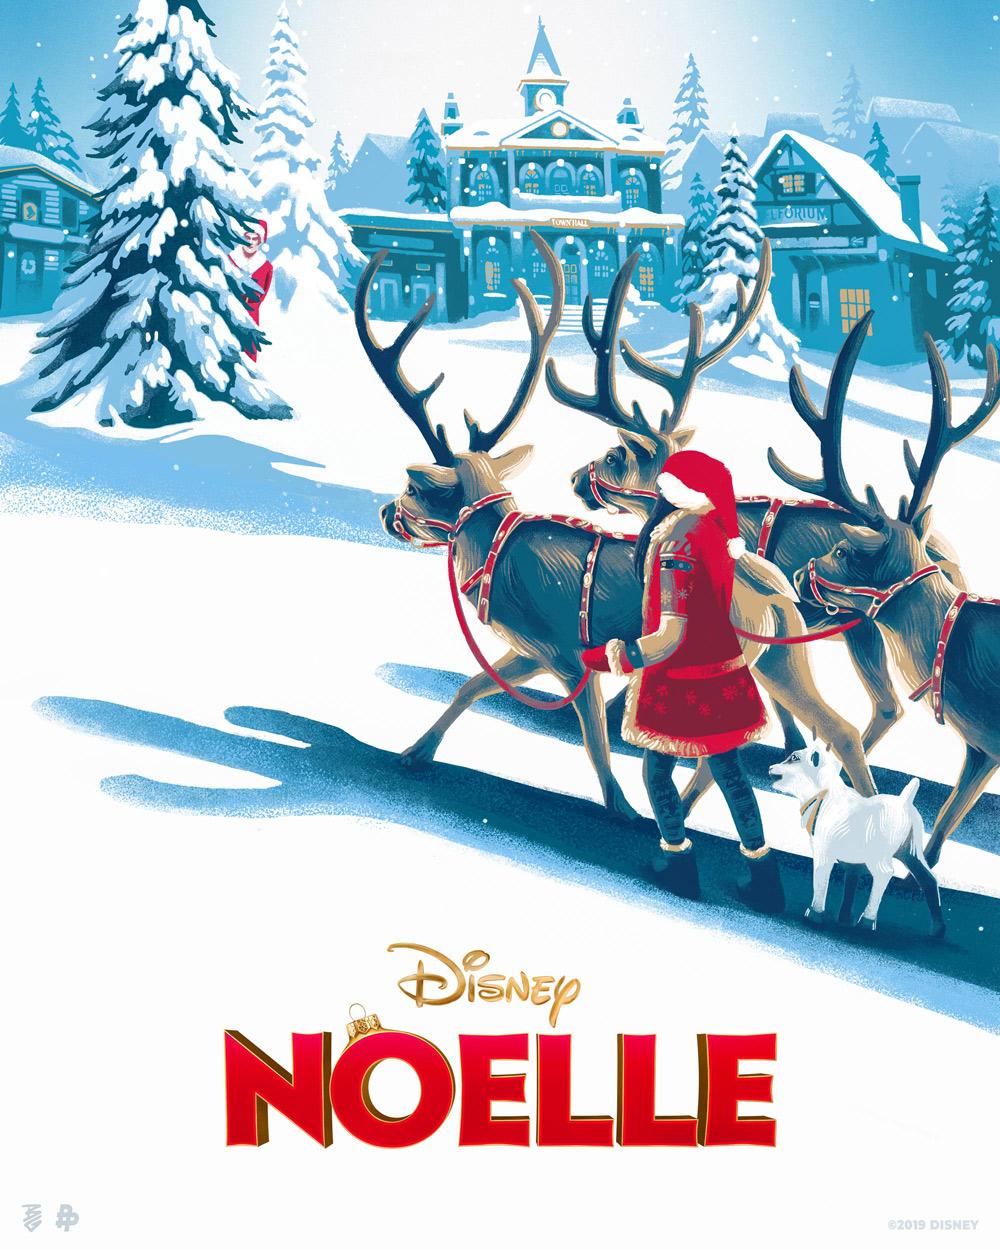 Disney Noelle Movie Poster